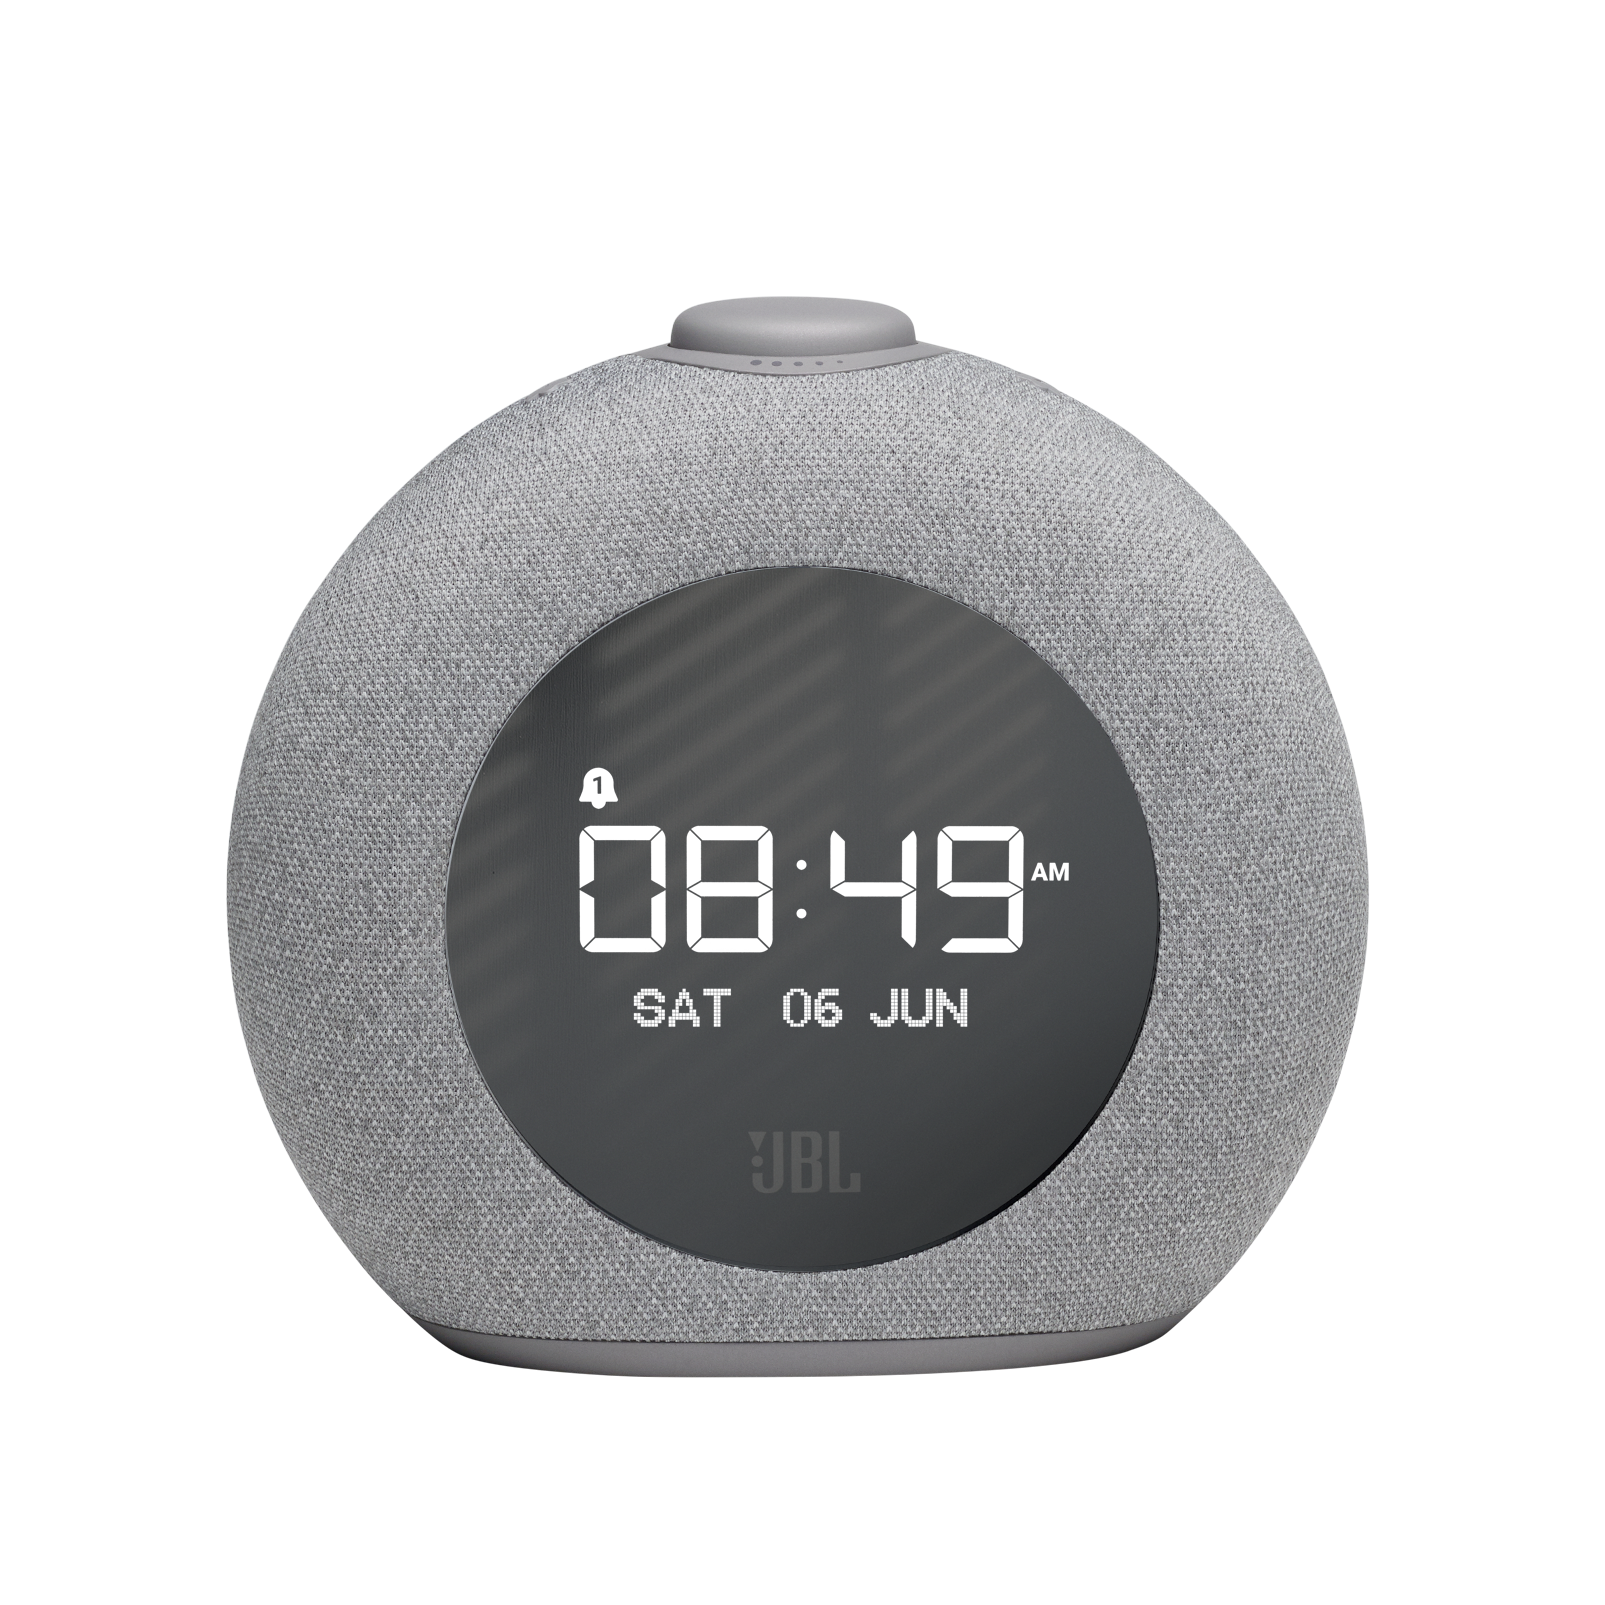 JBL Horizon 2 DAB - Grey - Bluetooth clock radio speaker with DAB/DAB+/FM - Front